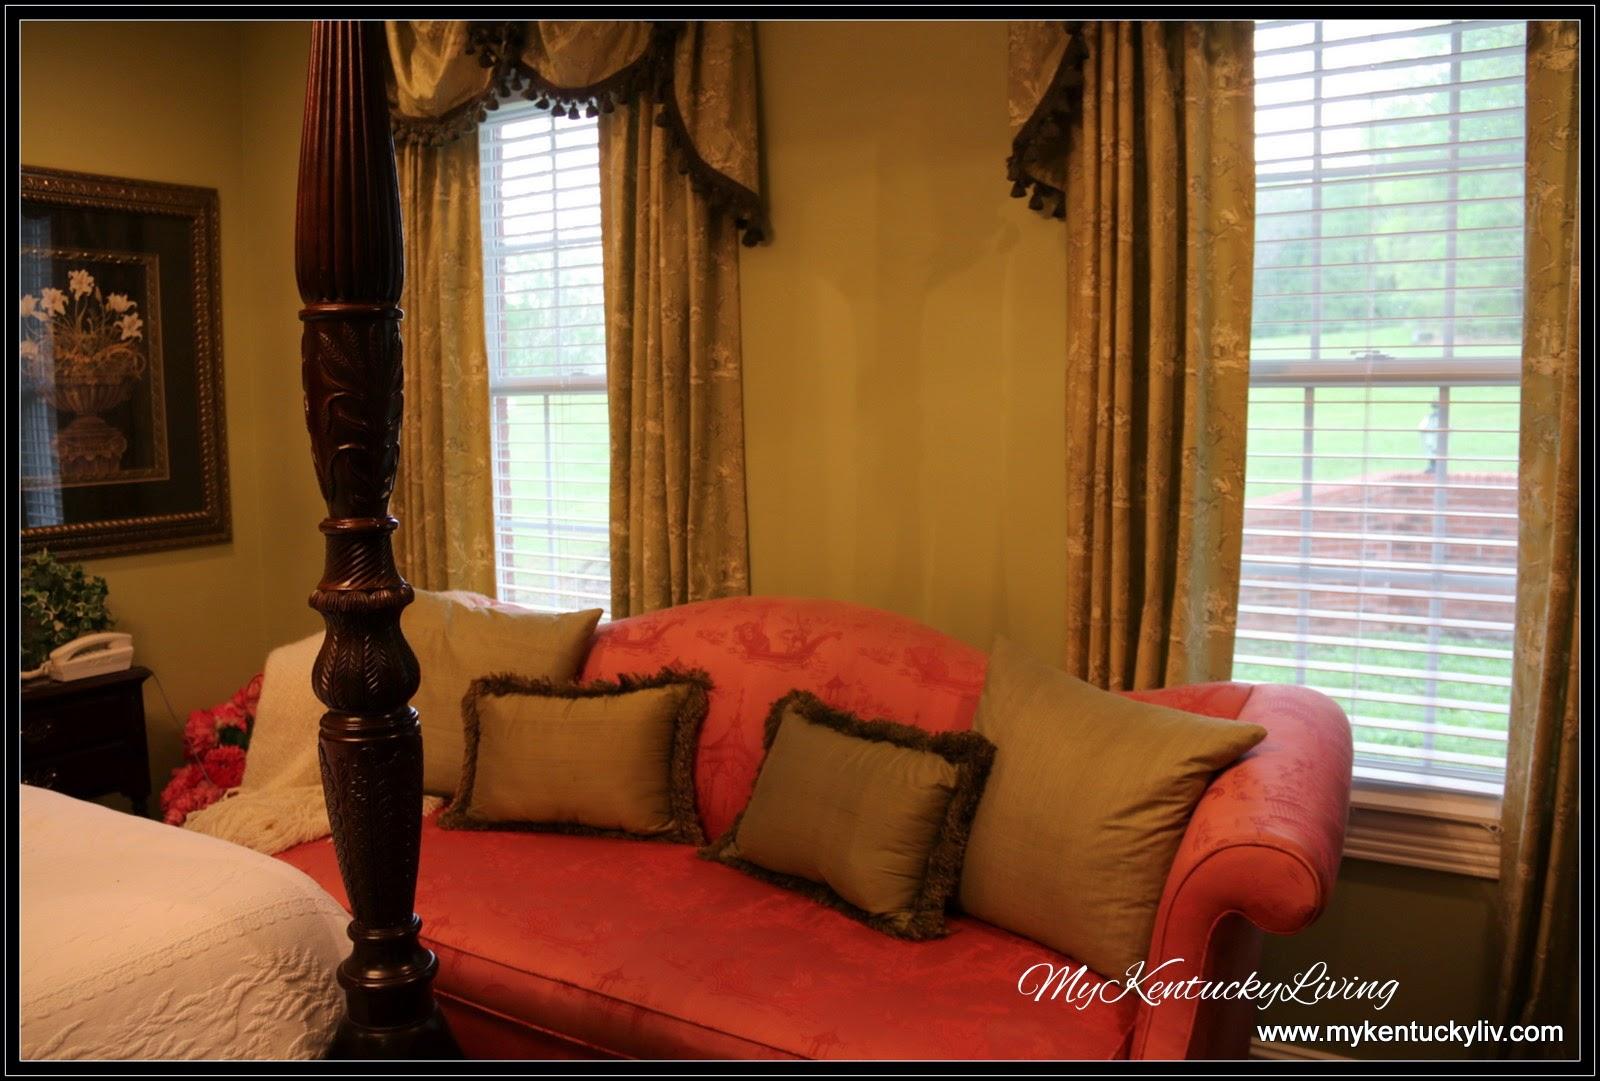 Ethan Allen Bedroom Furniture Discontinued Gembloong